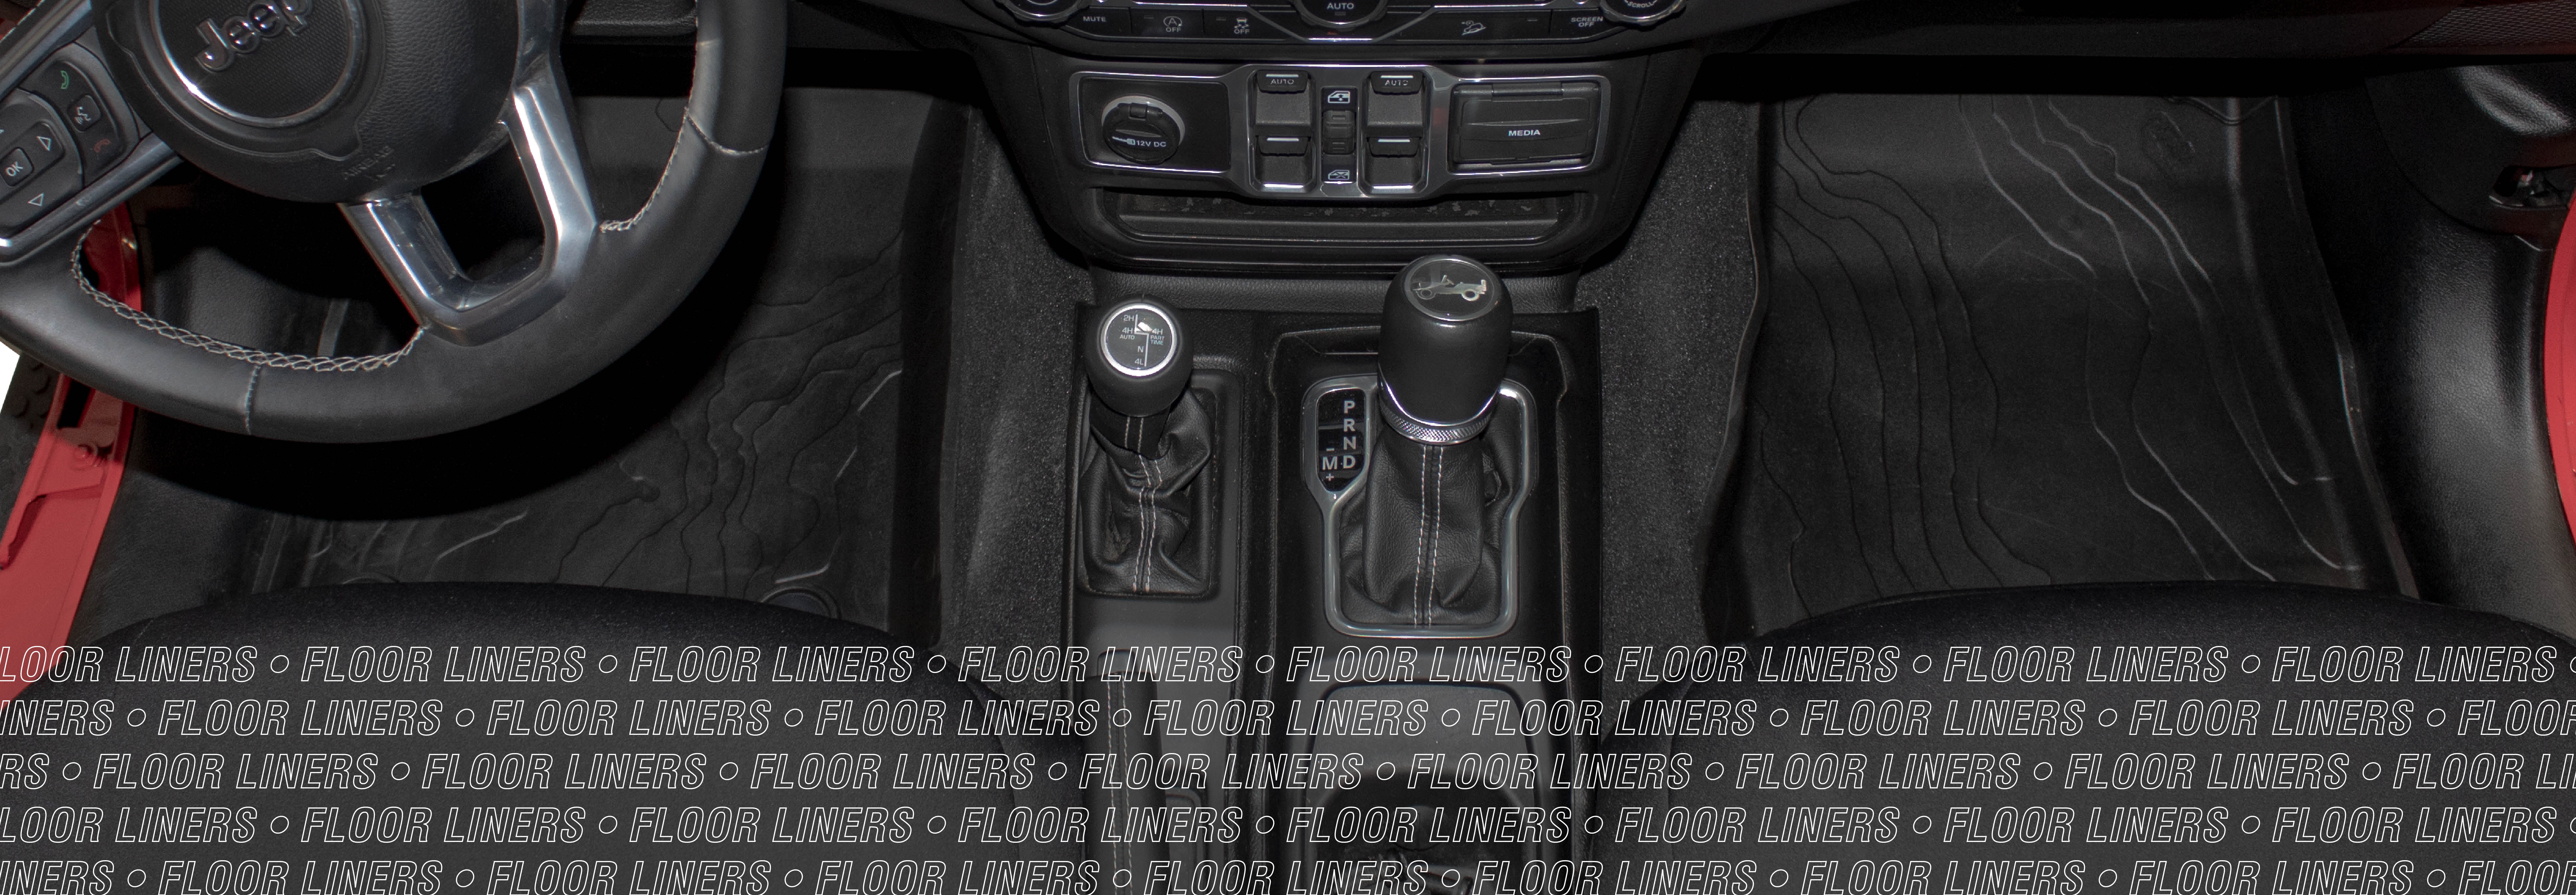 floor-liners2.jpg